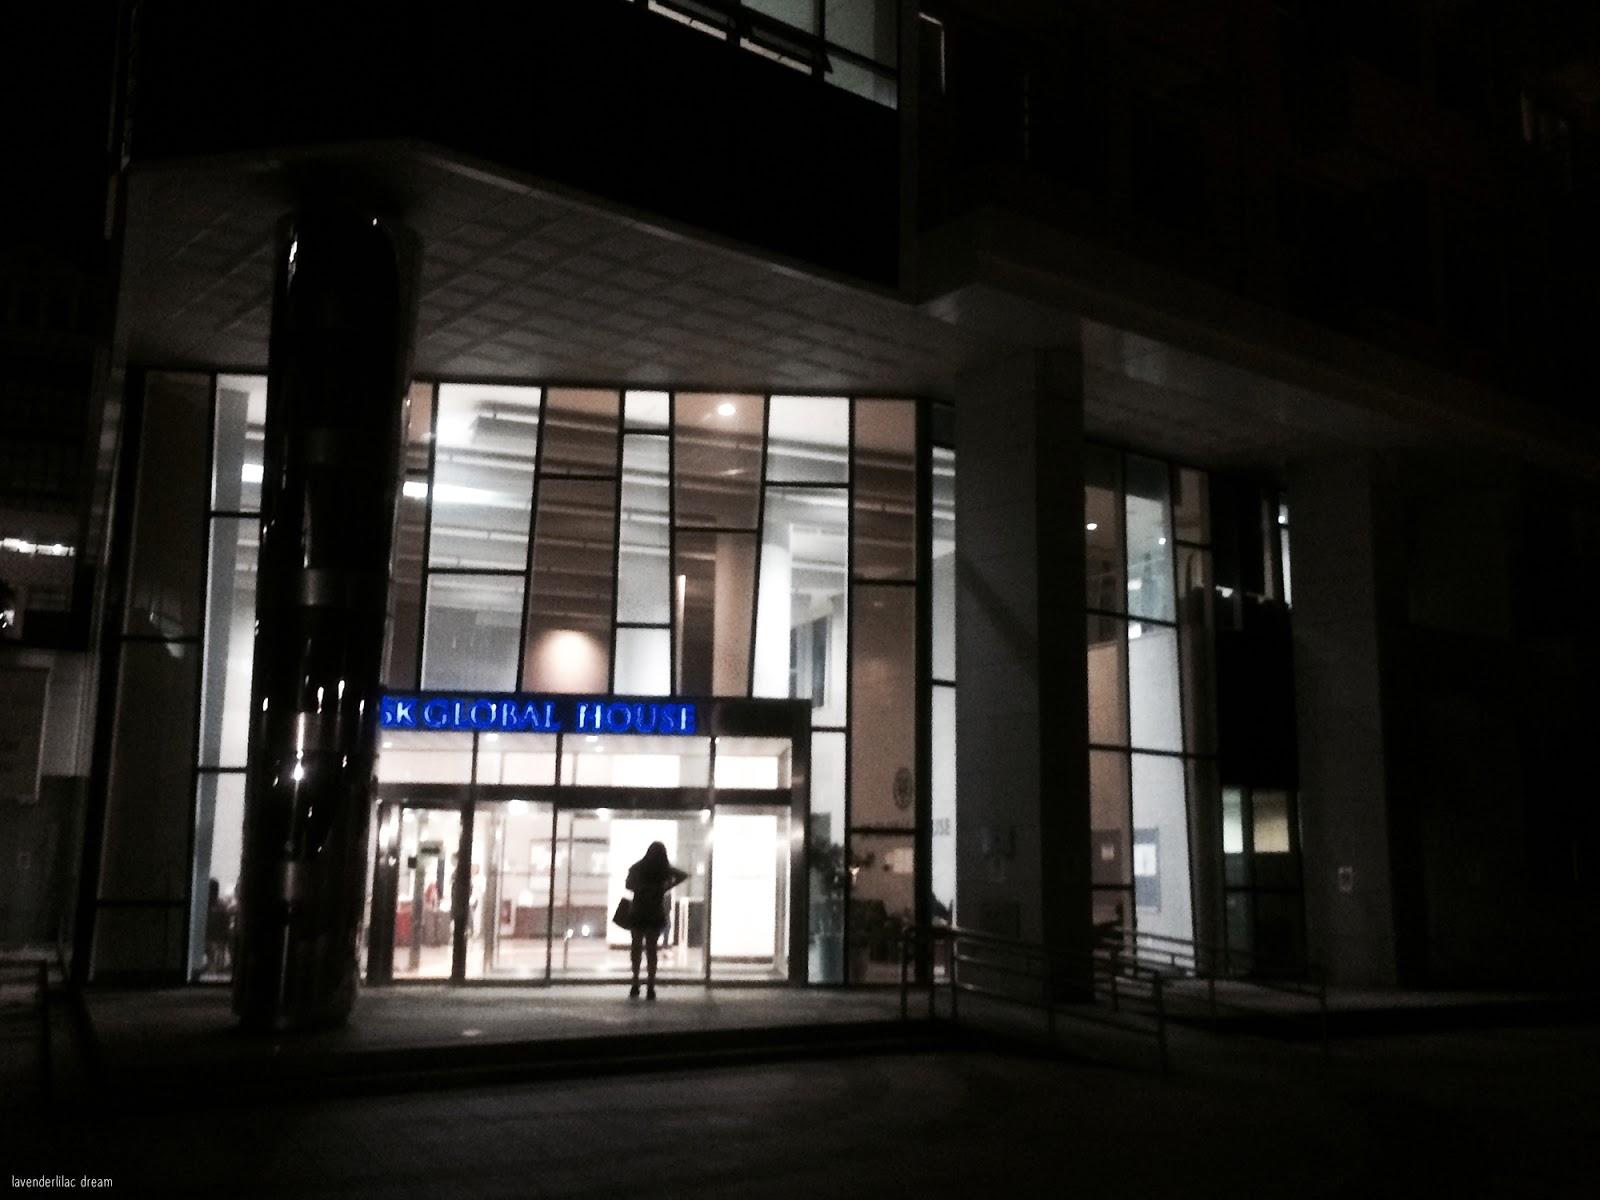 South Korea, Seoul, Sinchon, Yonsei University, YISS 2014, SK Global House entrance